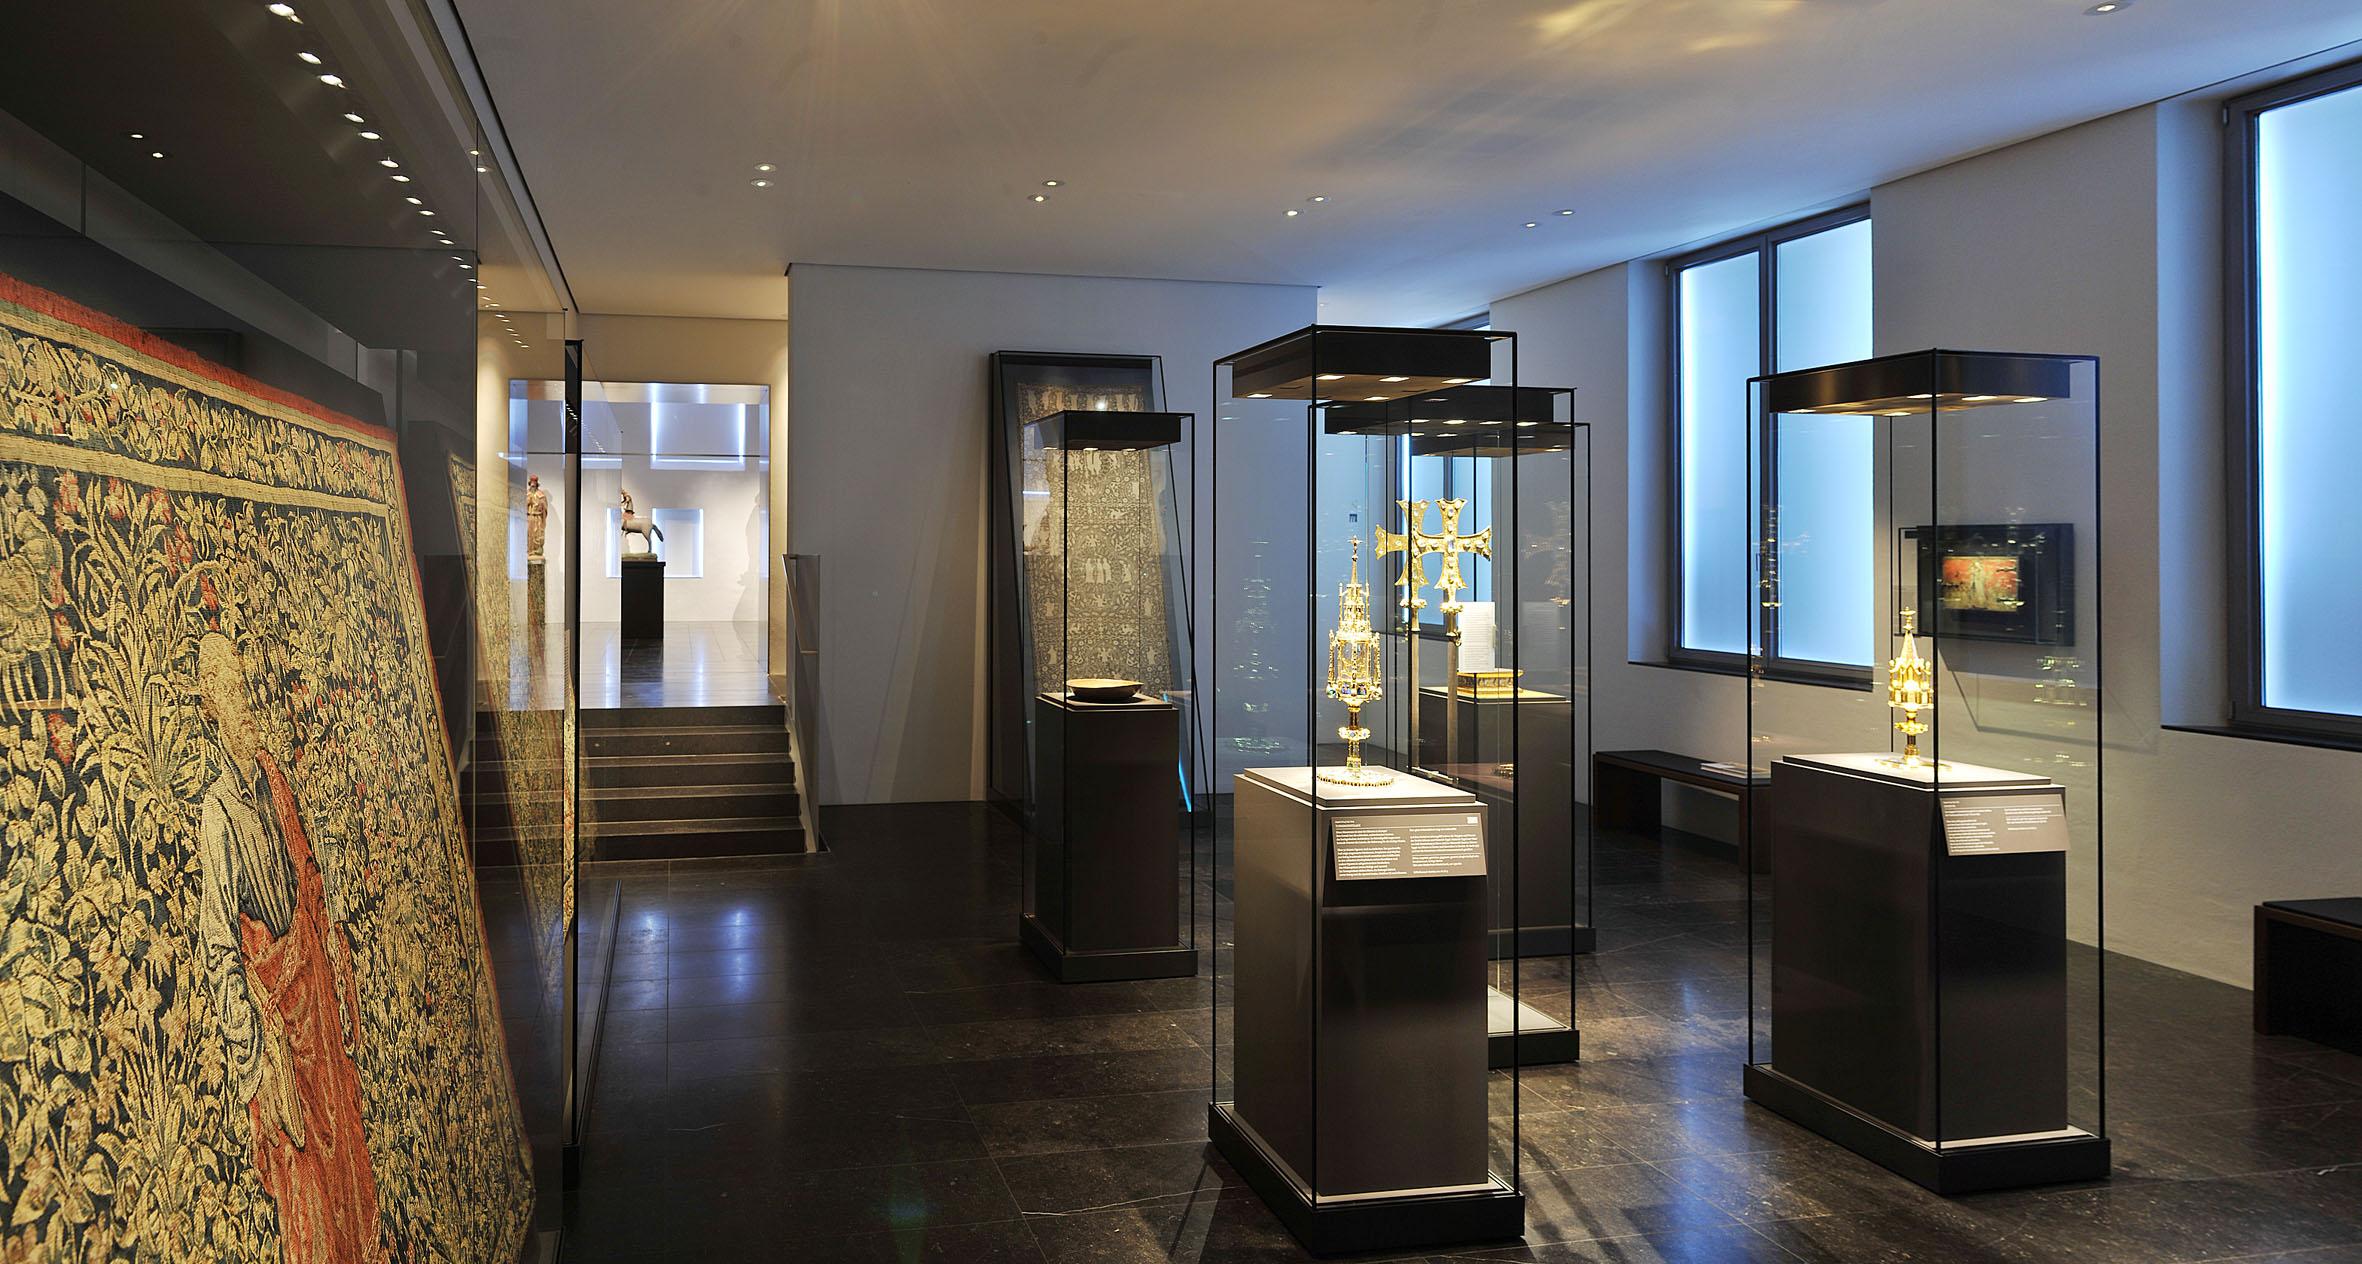 Stiftsmuseum Staatsbibliothek Xanten – Wrede Architekten